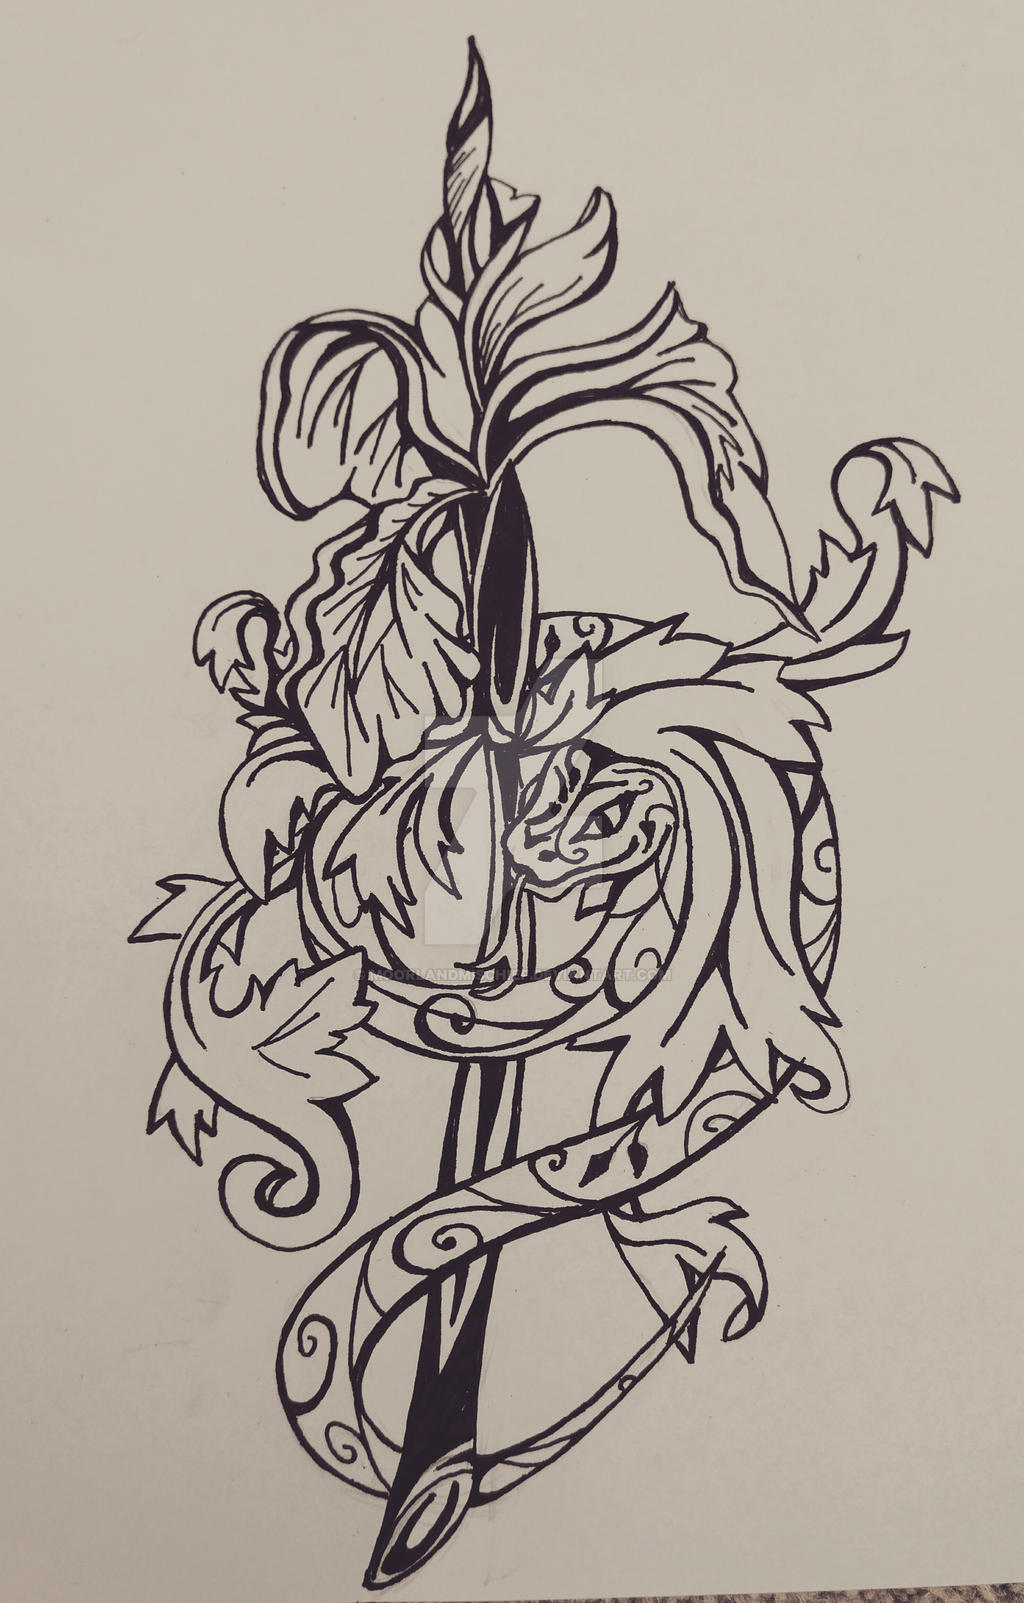 16228ddf8c570 ... MoorlandMischief The Snake and the Iris (tattoo design) by  MoorlandMischief